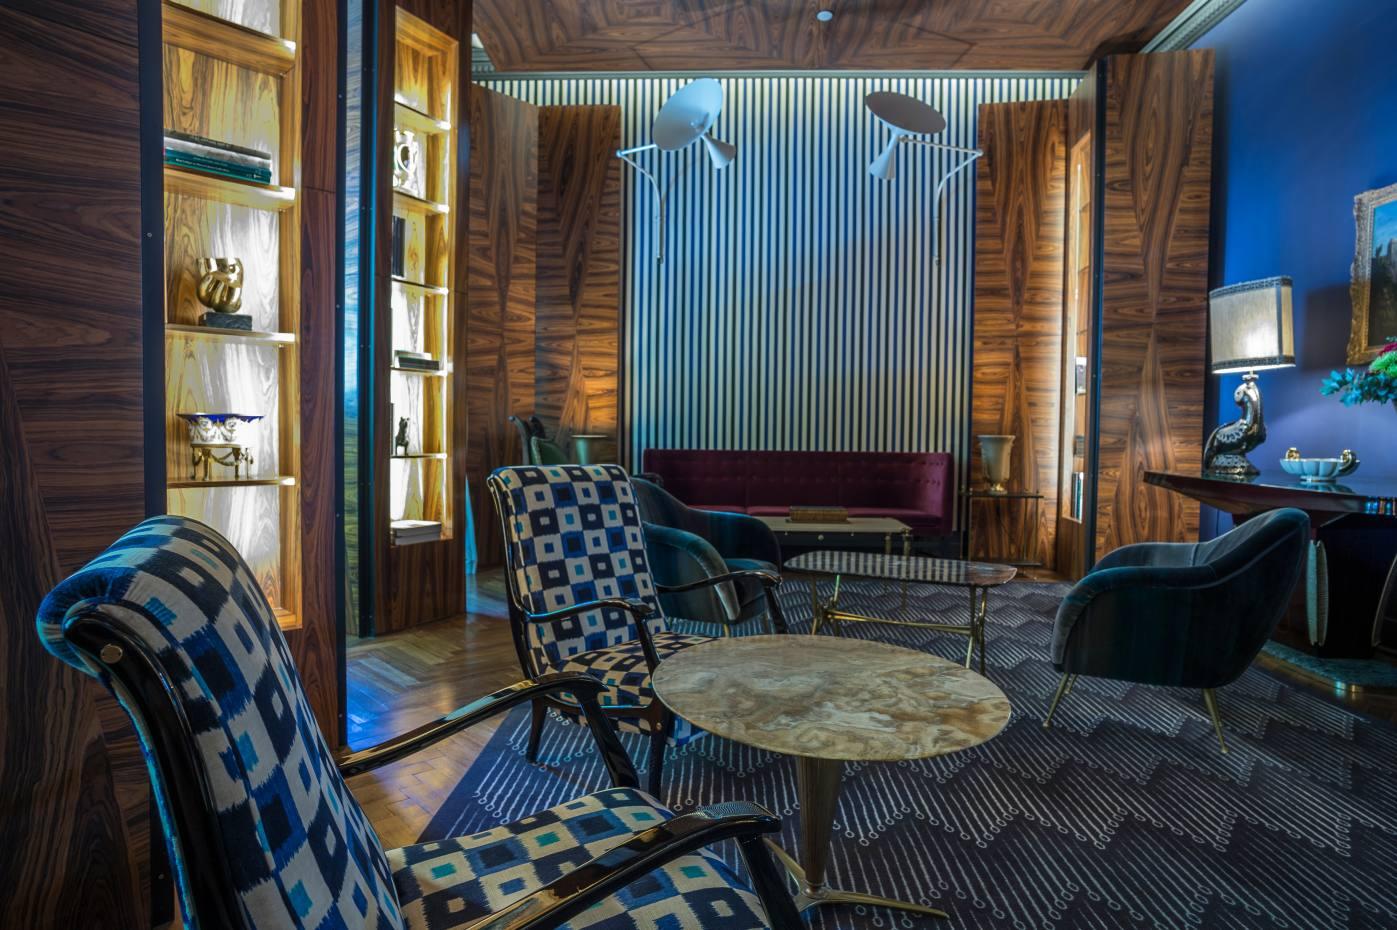 The understated, elegant boutique Hotel Valverde